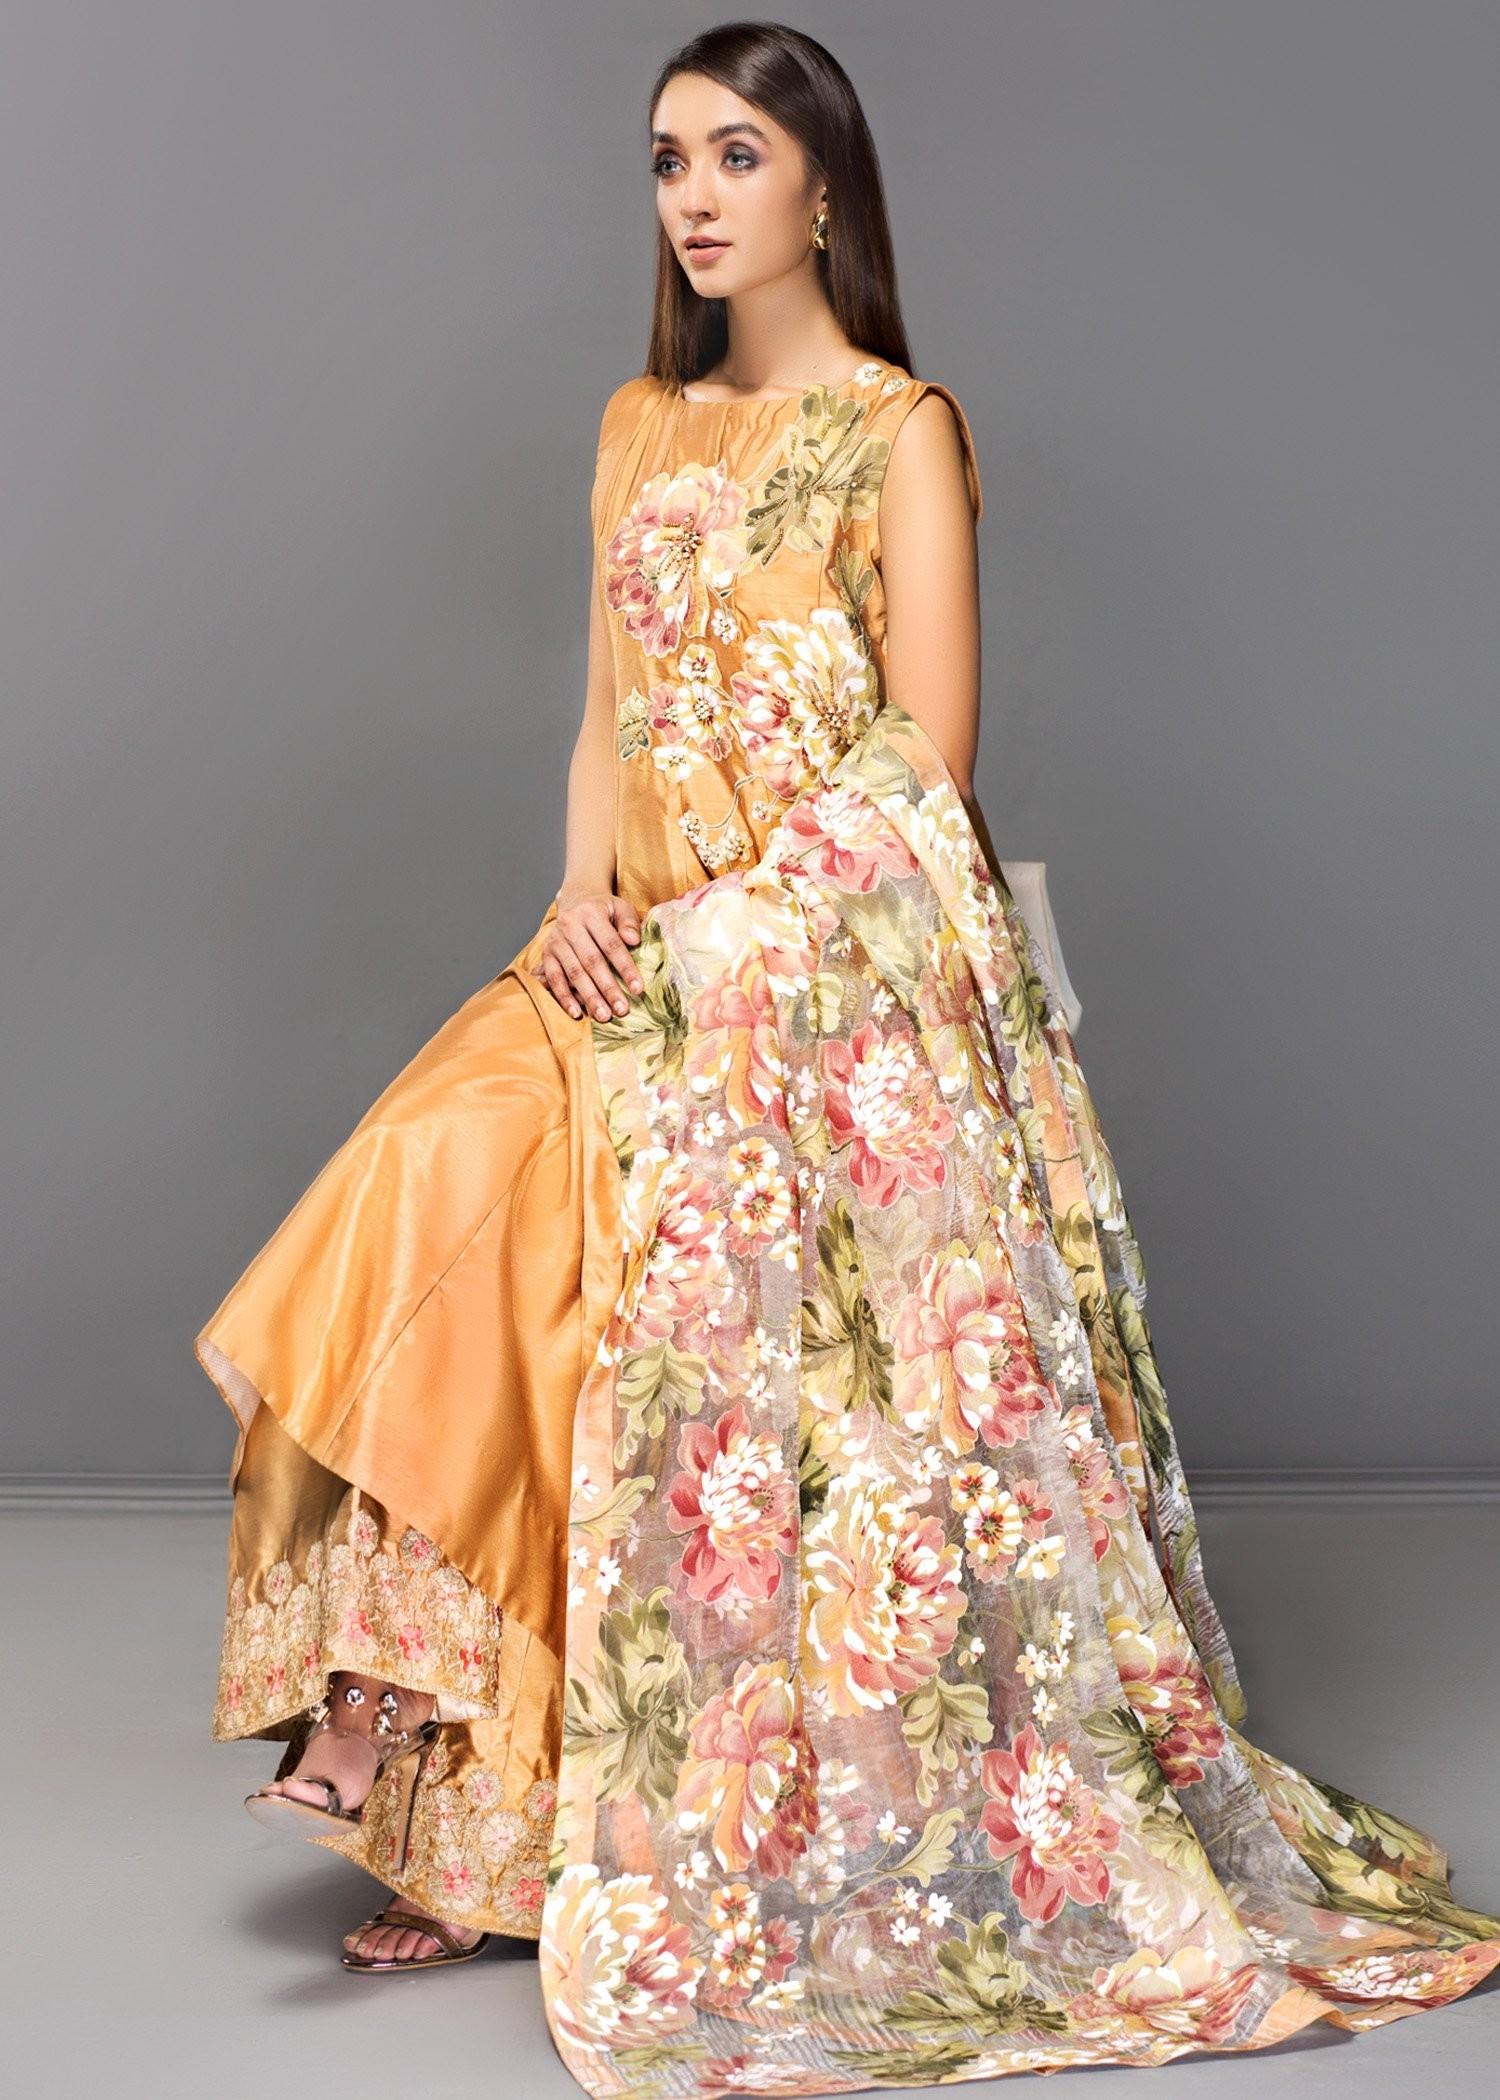 Digital Flower-Formal dress